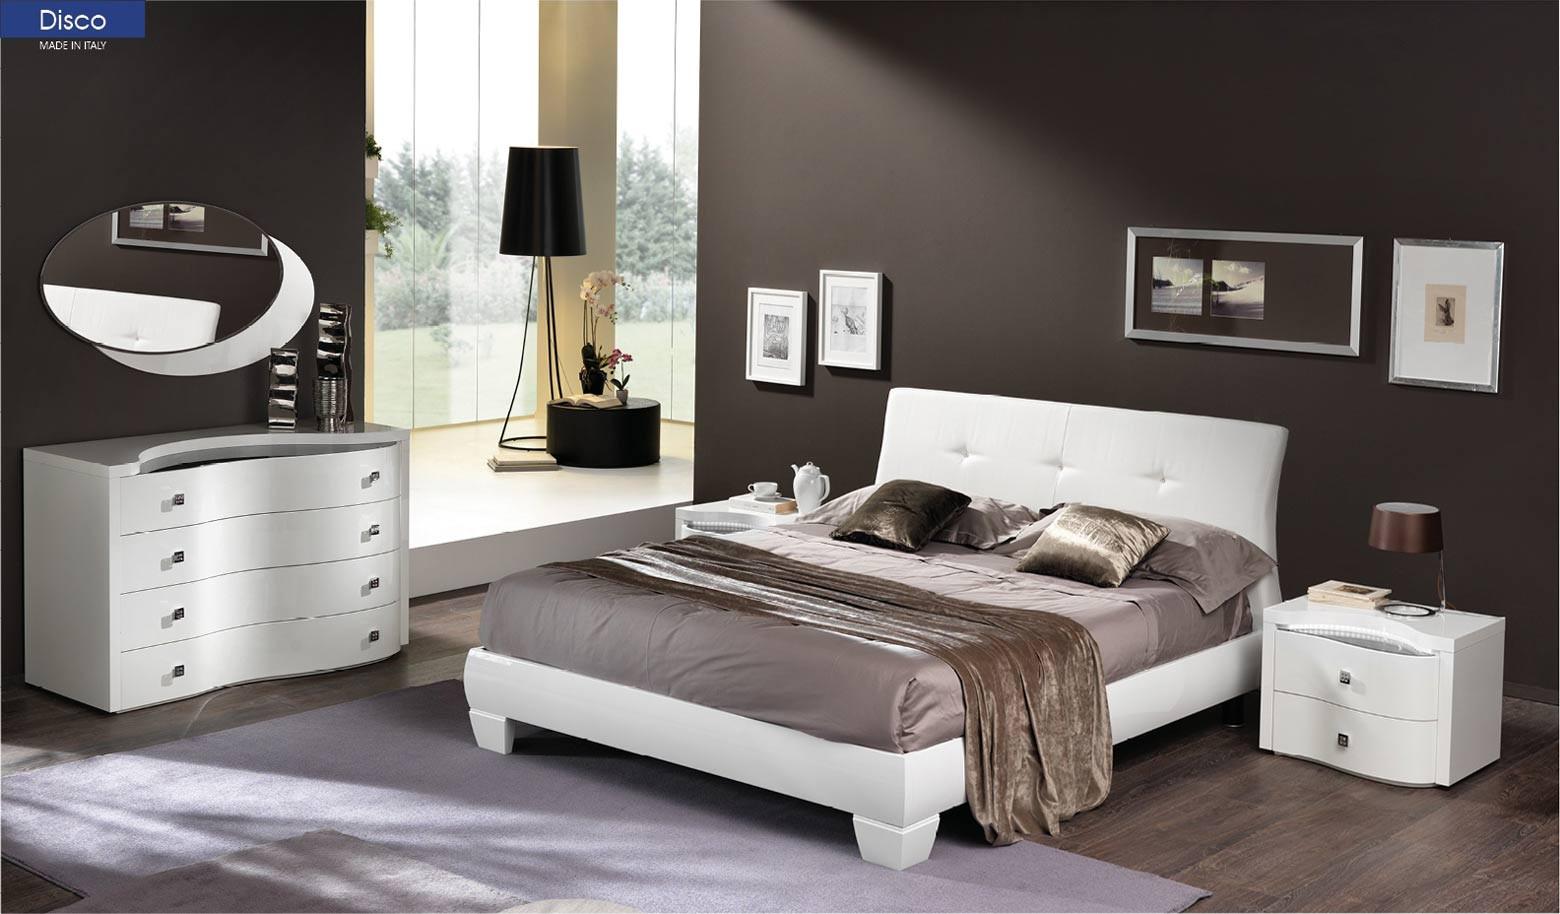 Disco Modern Bedroom Set in White Italian Finish